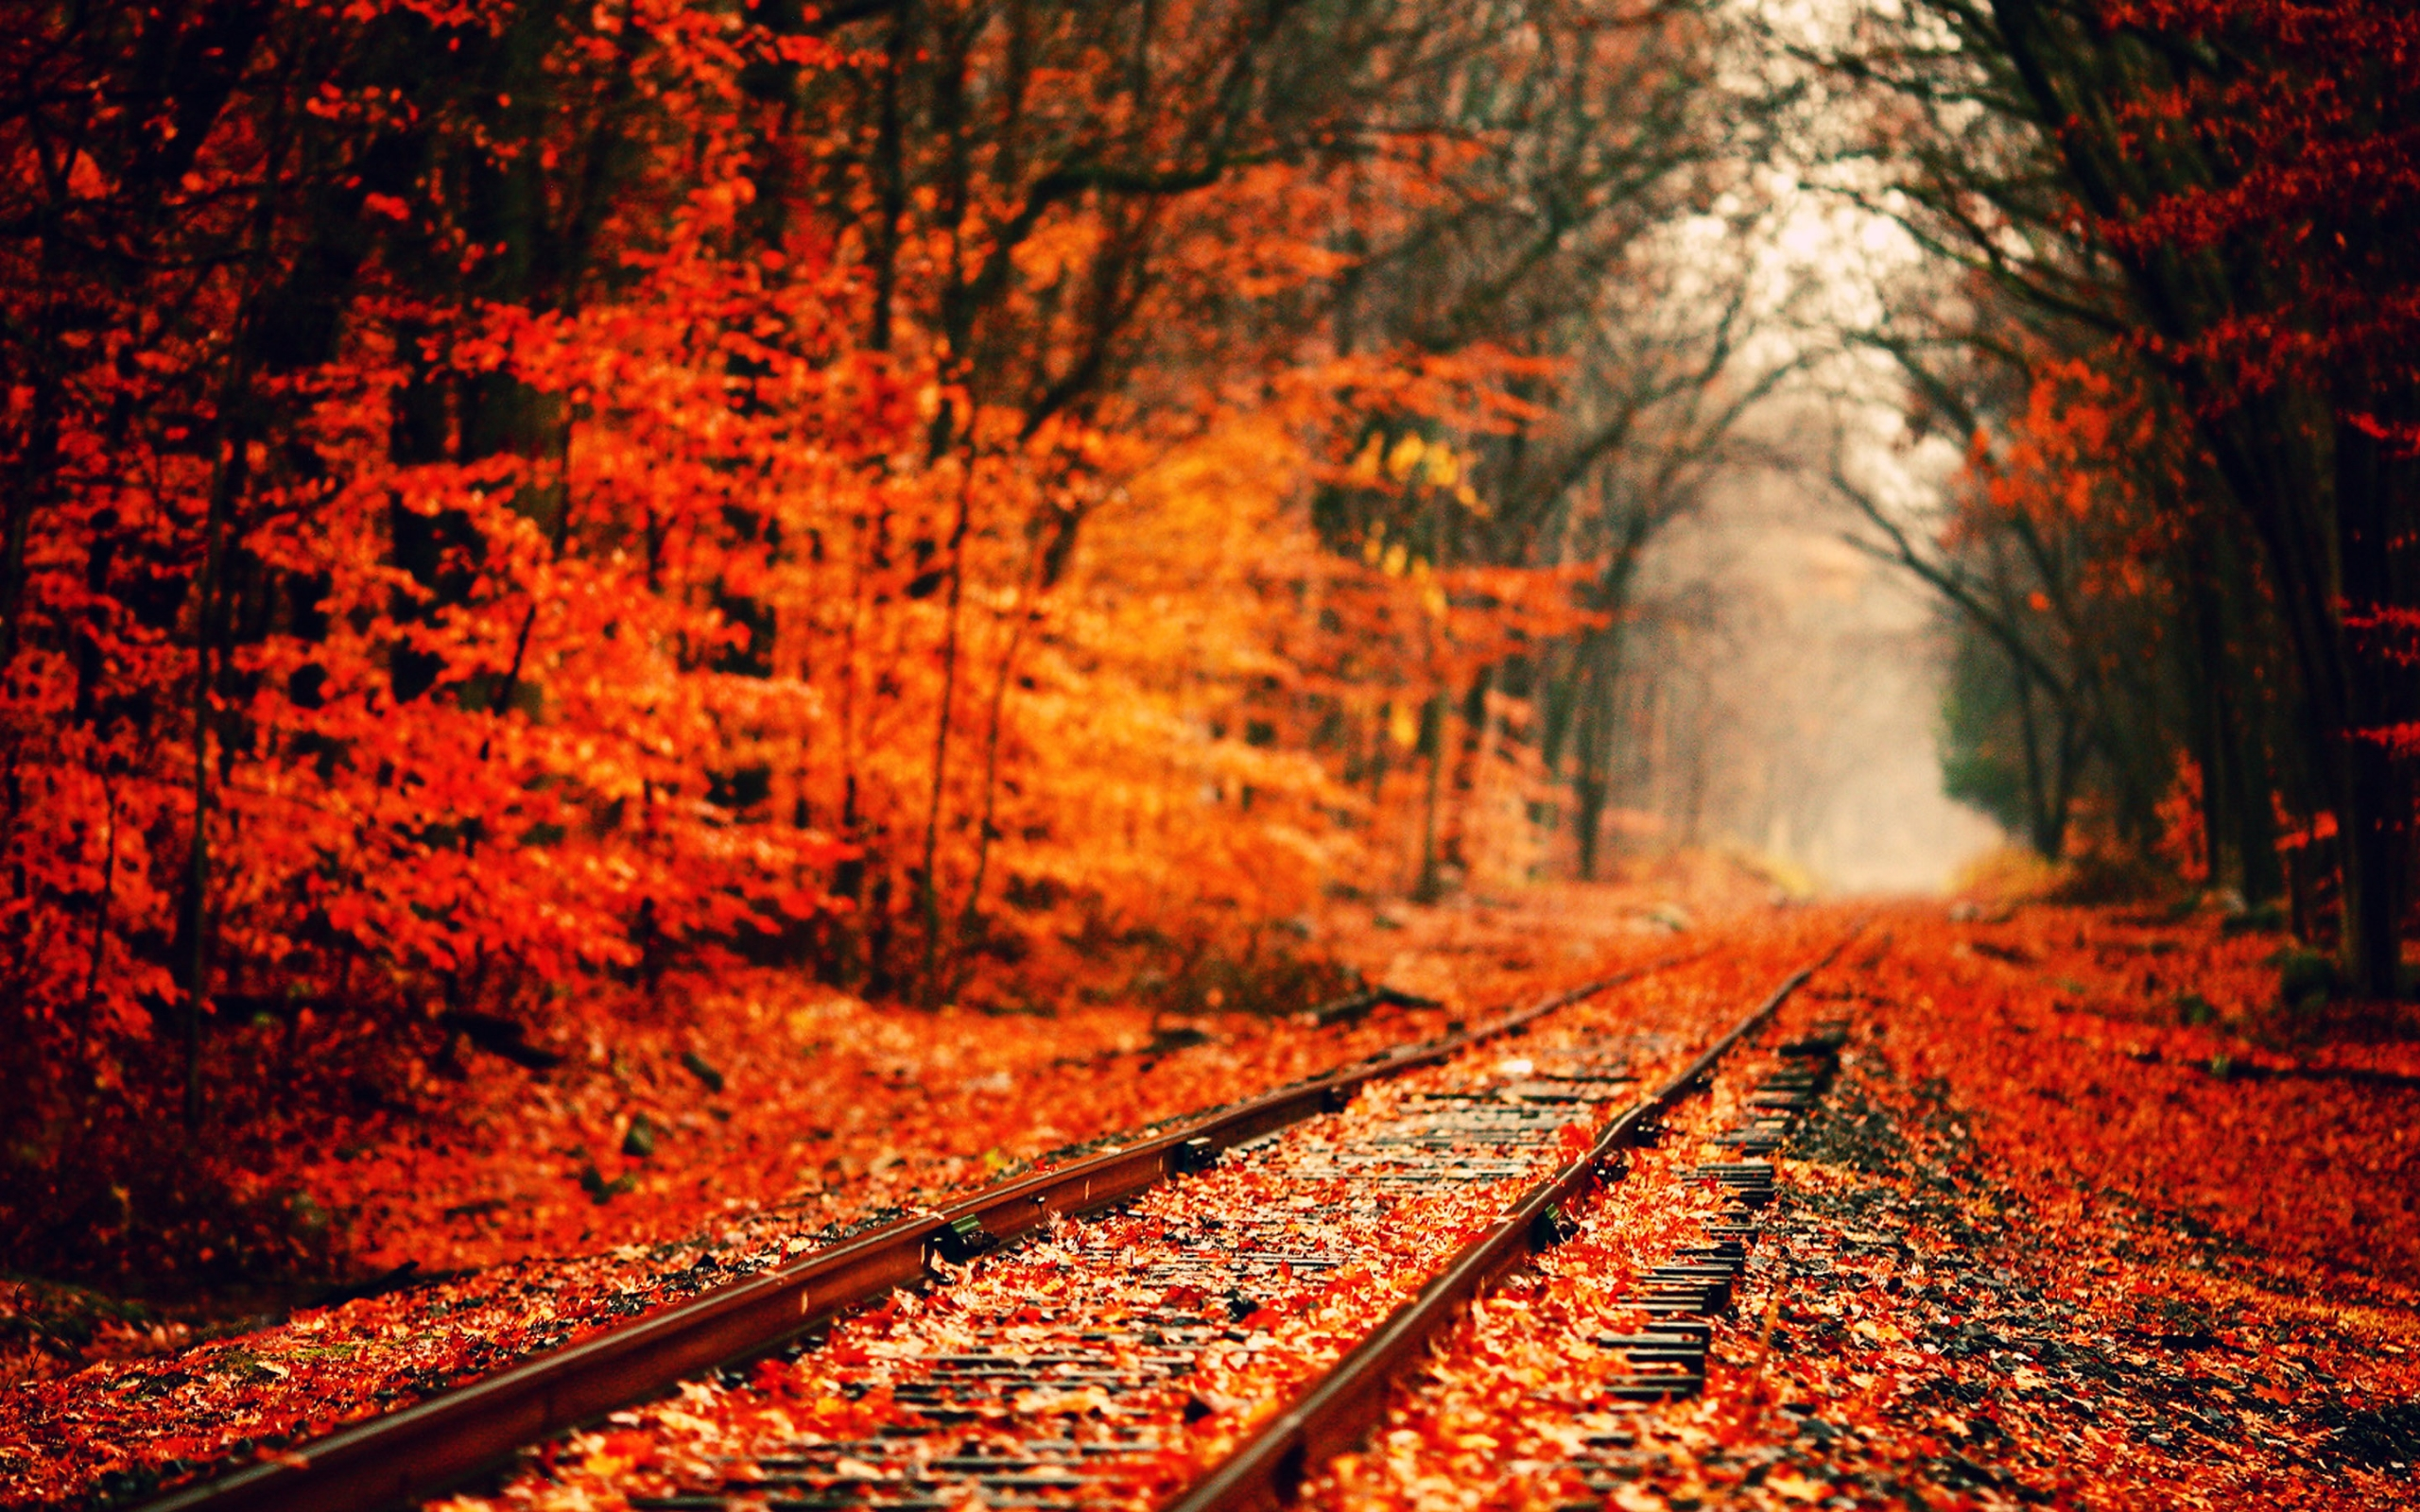 Fall Leaves Desktop Wallpaper 8tracks Radio That Fall Aesthetic 11 Songs Free And